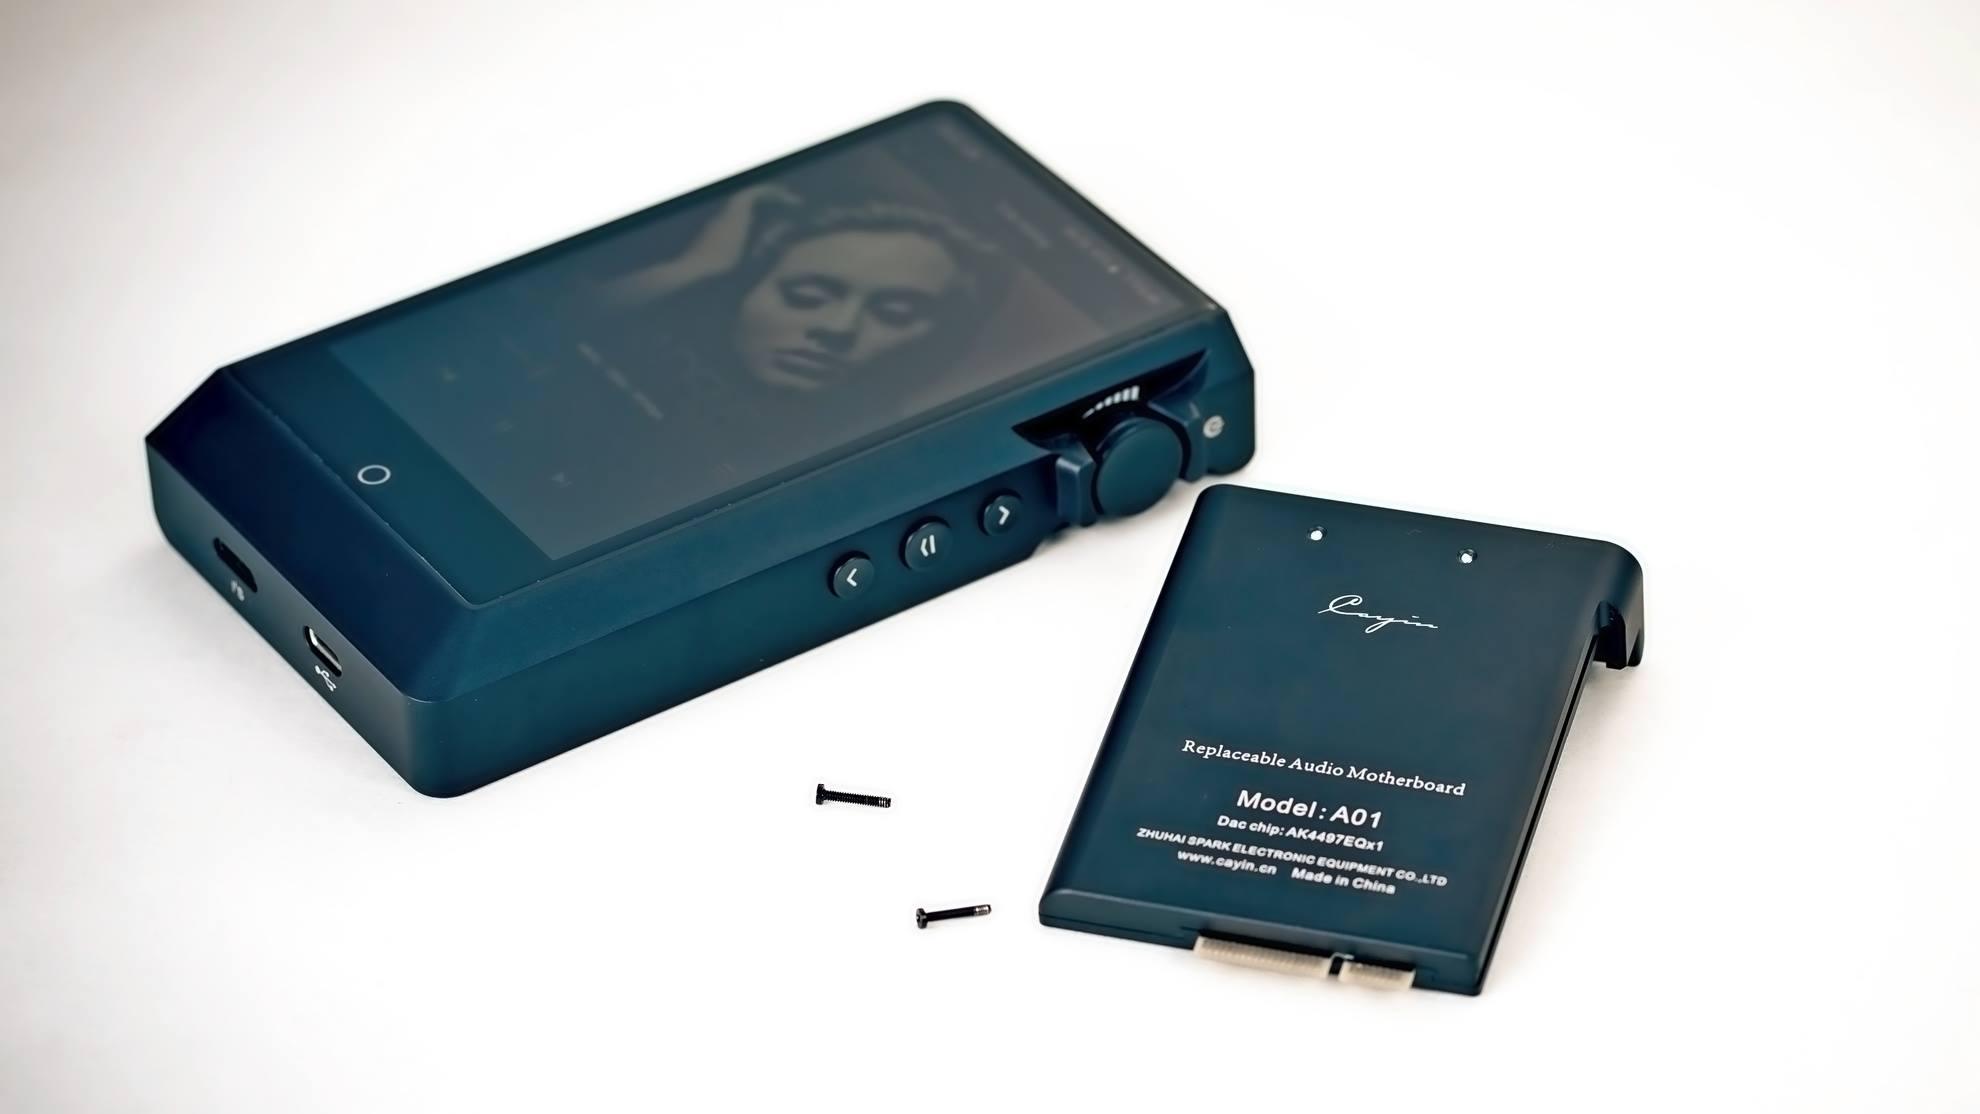 Cayin N6II  A01 Audio Motherboard